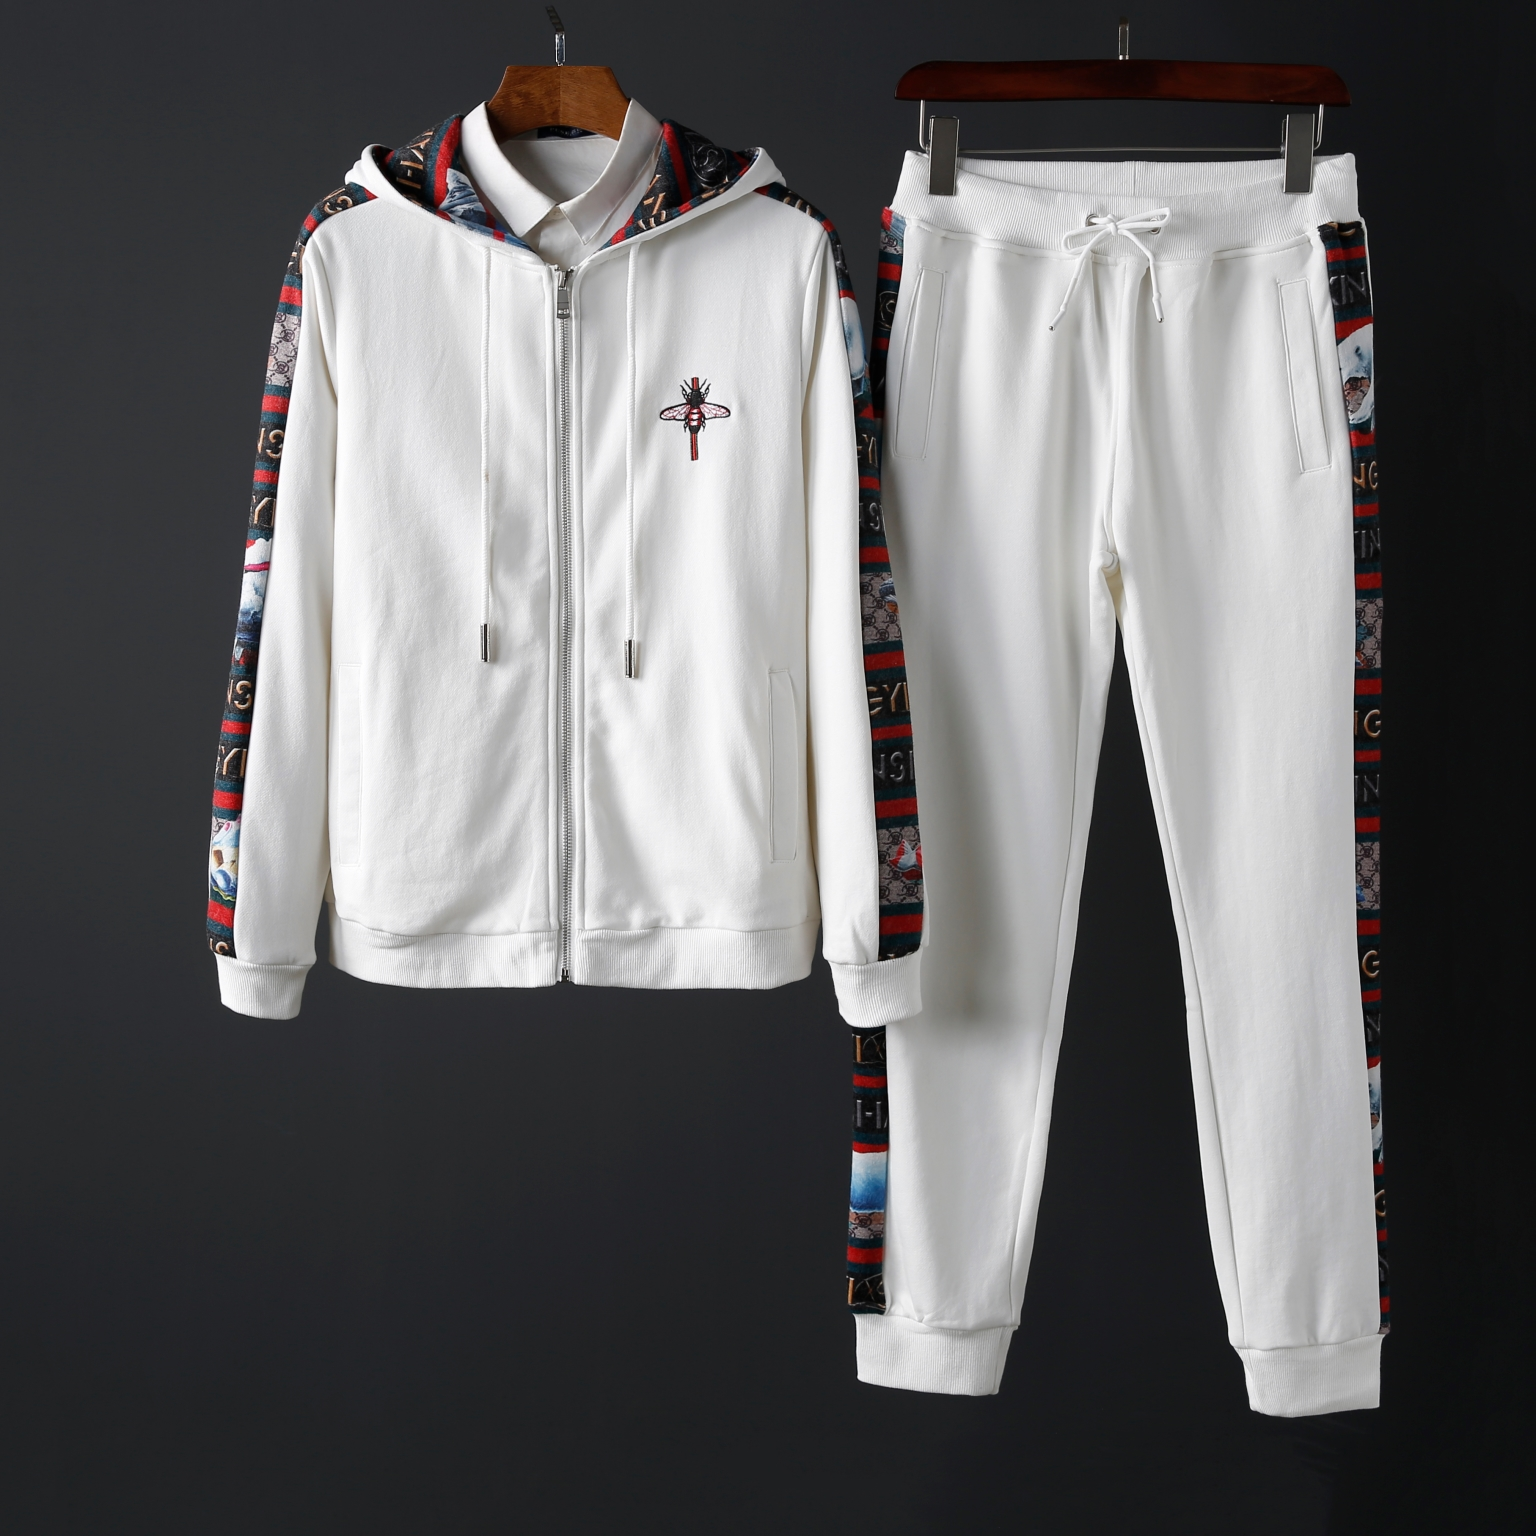 A274/C6601#秋冬高品质 运动休闲套装开衫卫衣外套长裤P200